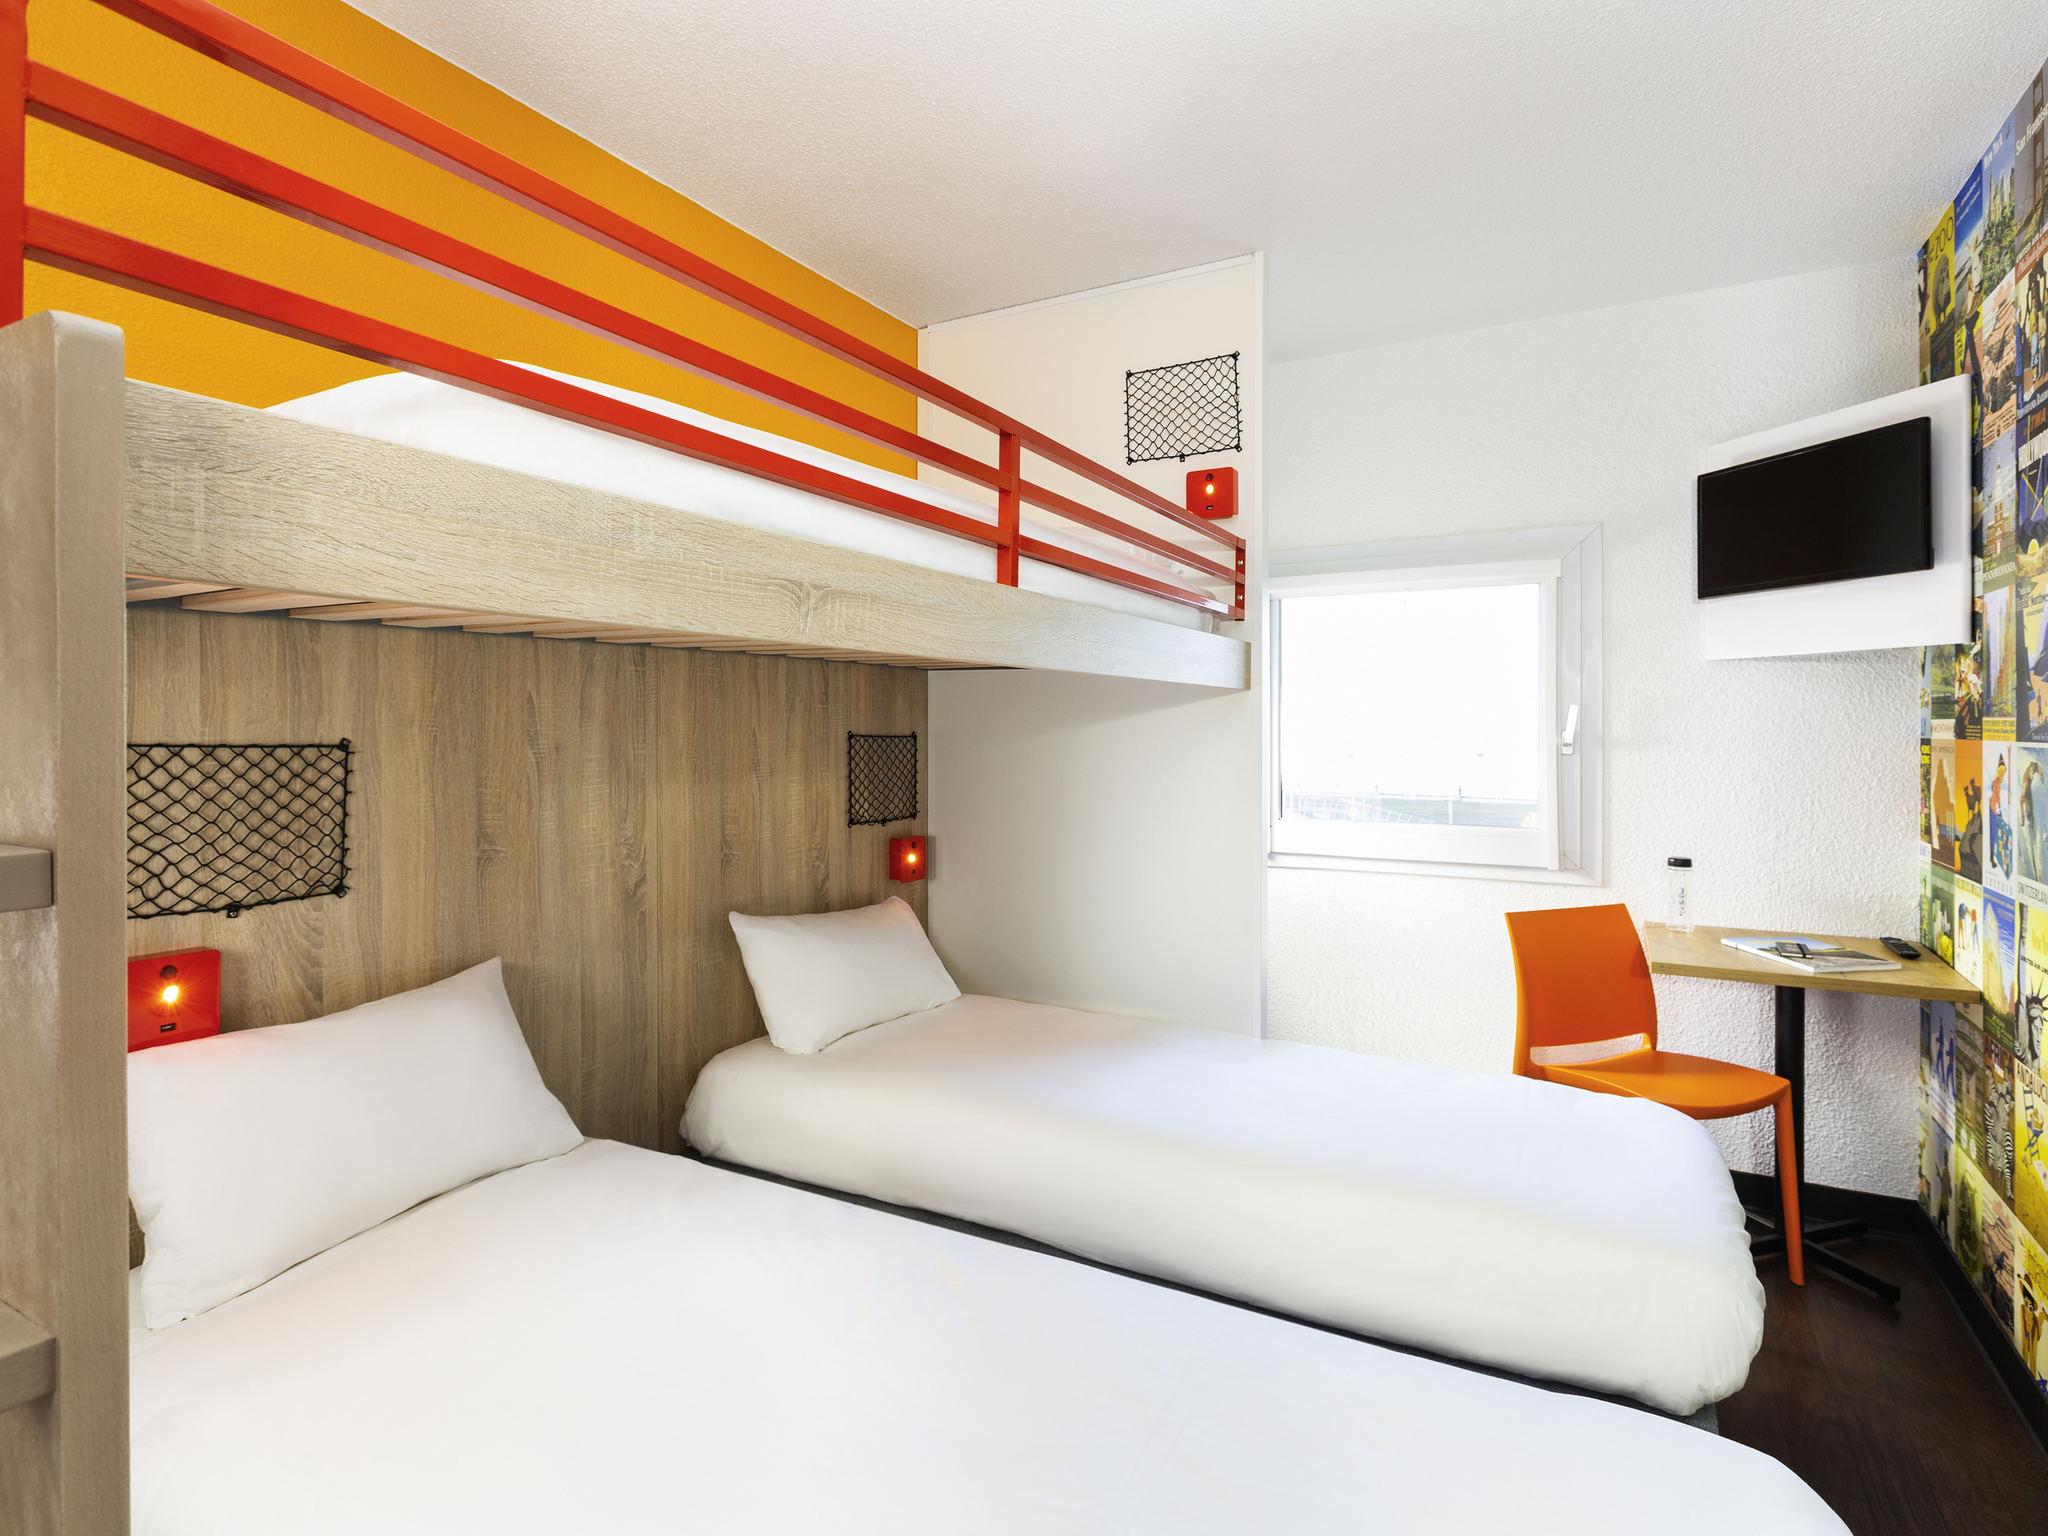 Hôtel - hotelF1 Nancy Sud